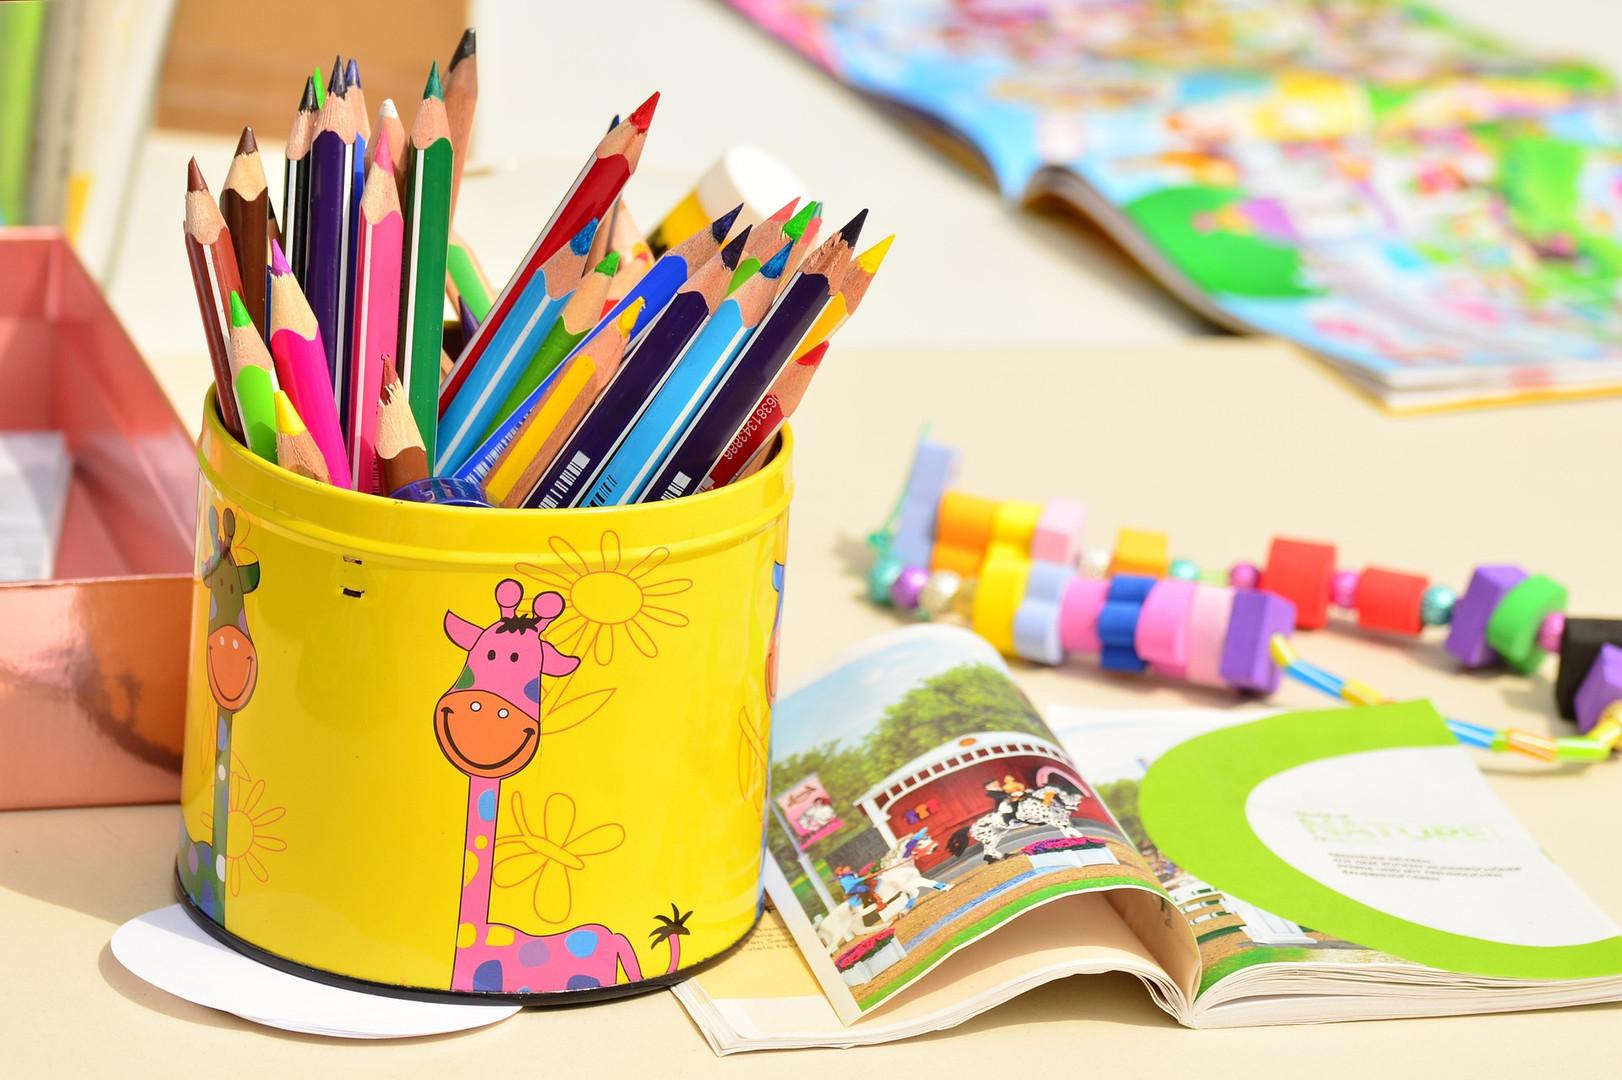 colored-pencils-1506589_1920.jpg